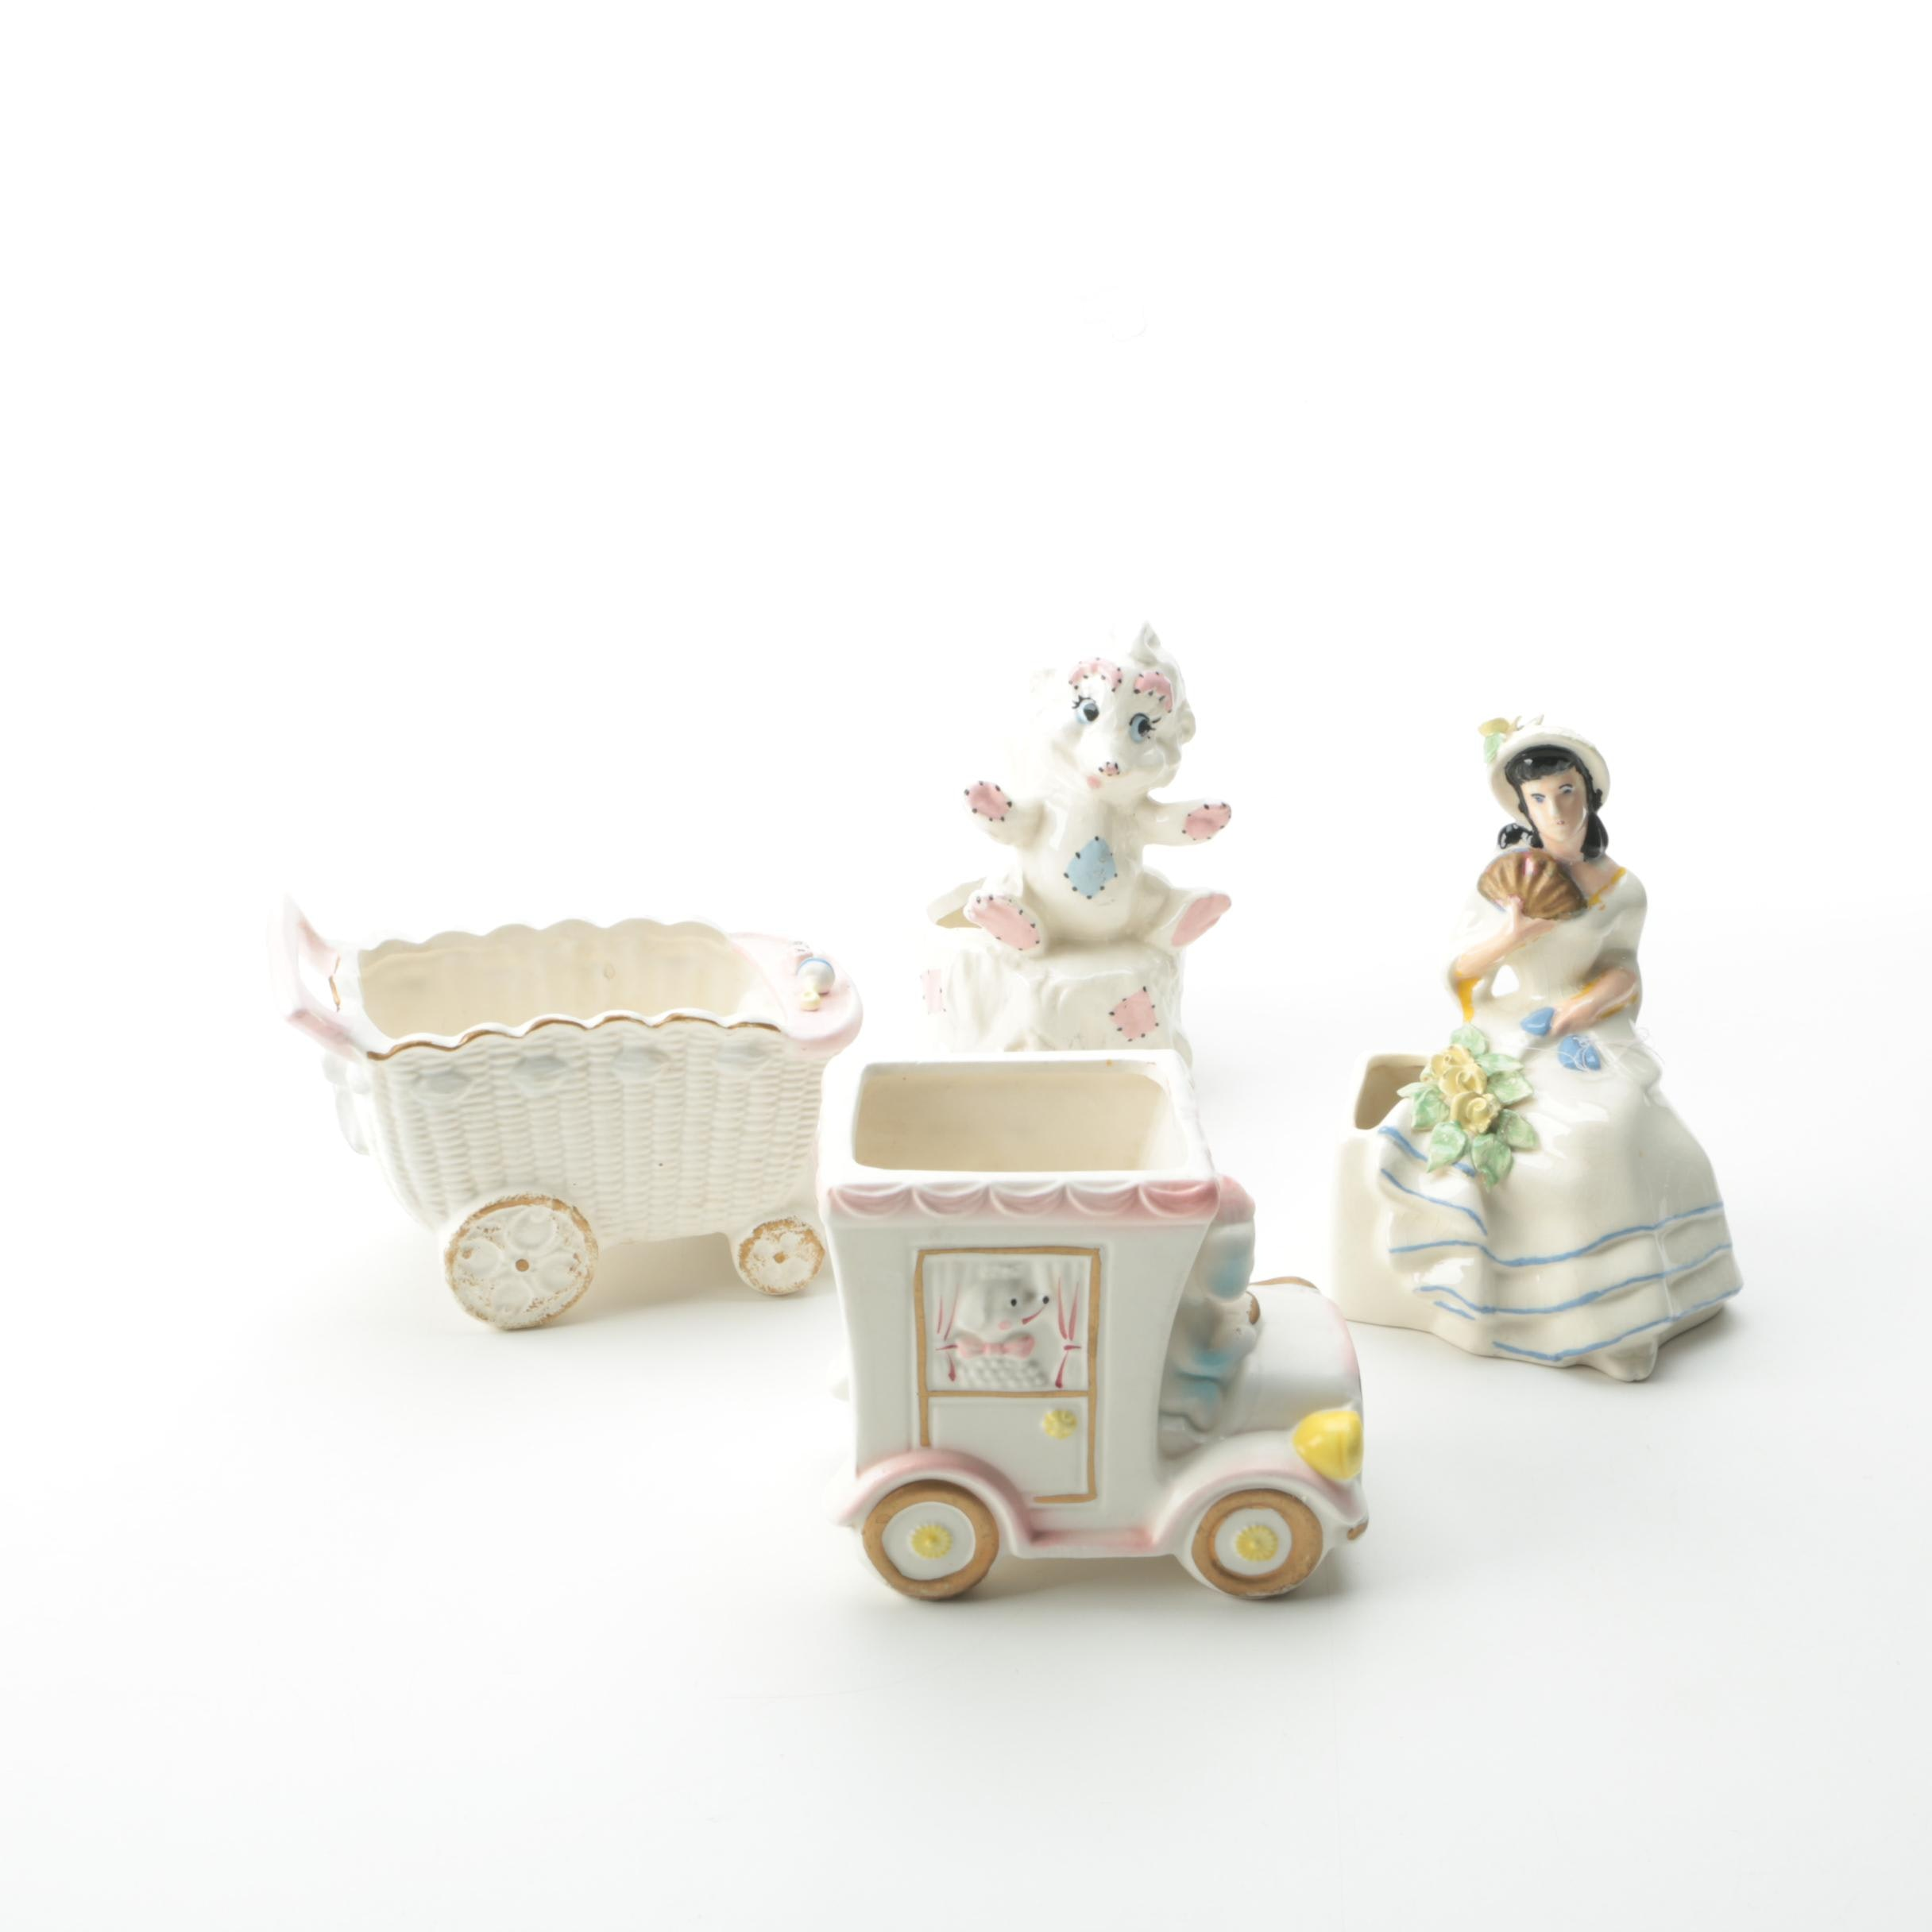 Ceramic Figurine Planters and Bud Vases Including Velco